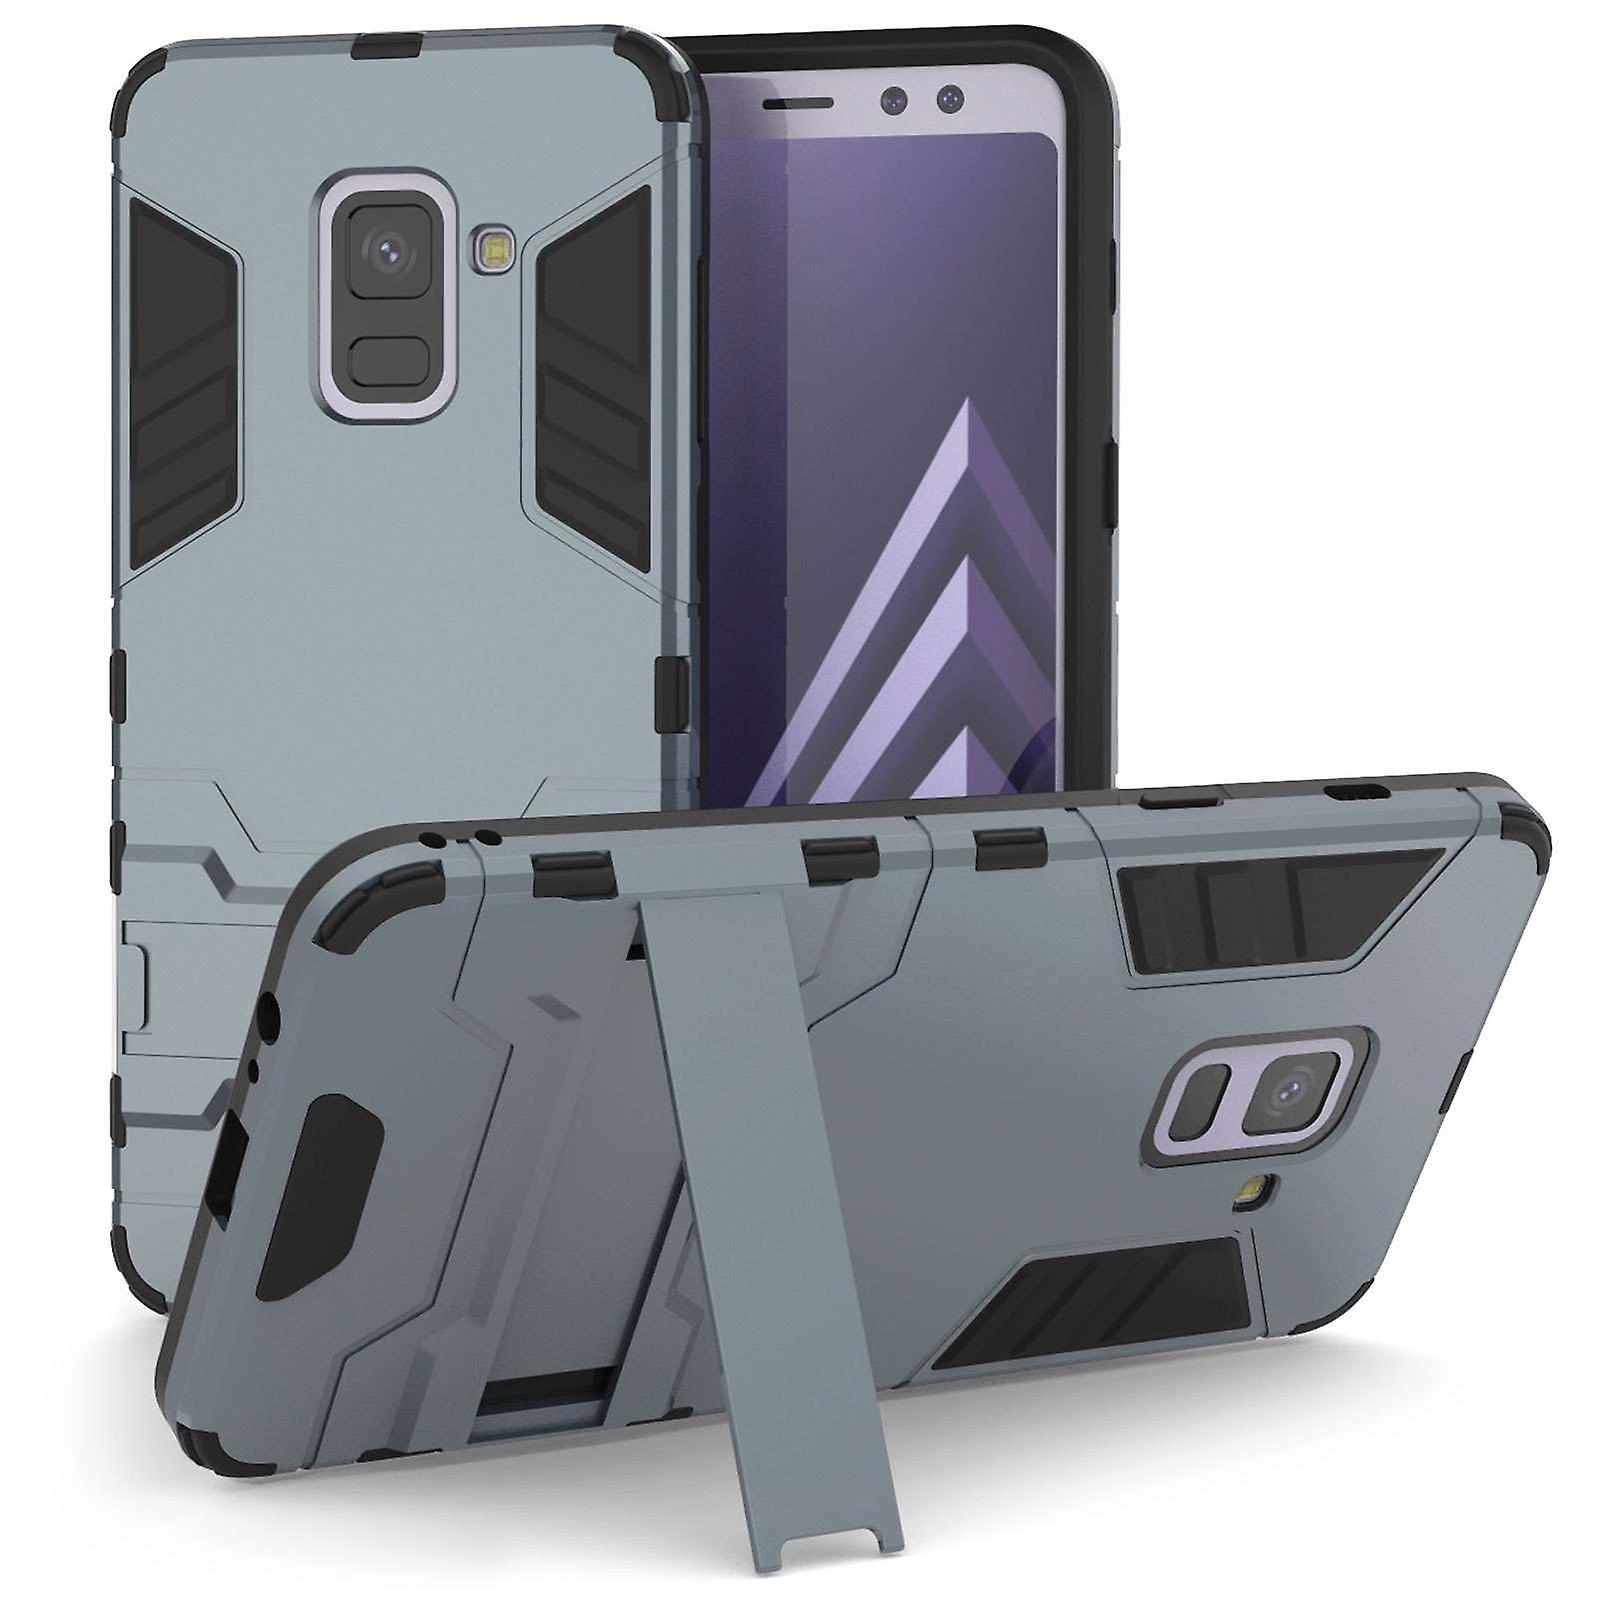 Samsung Galaxy A8 Plus (2018) Armour Kickstand Case - Steel Blue